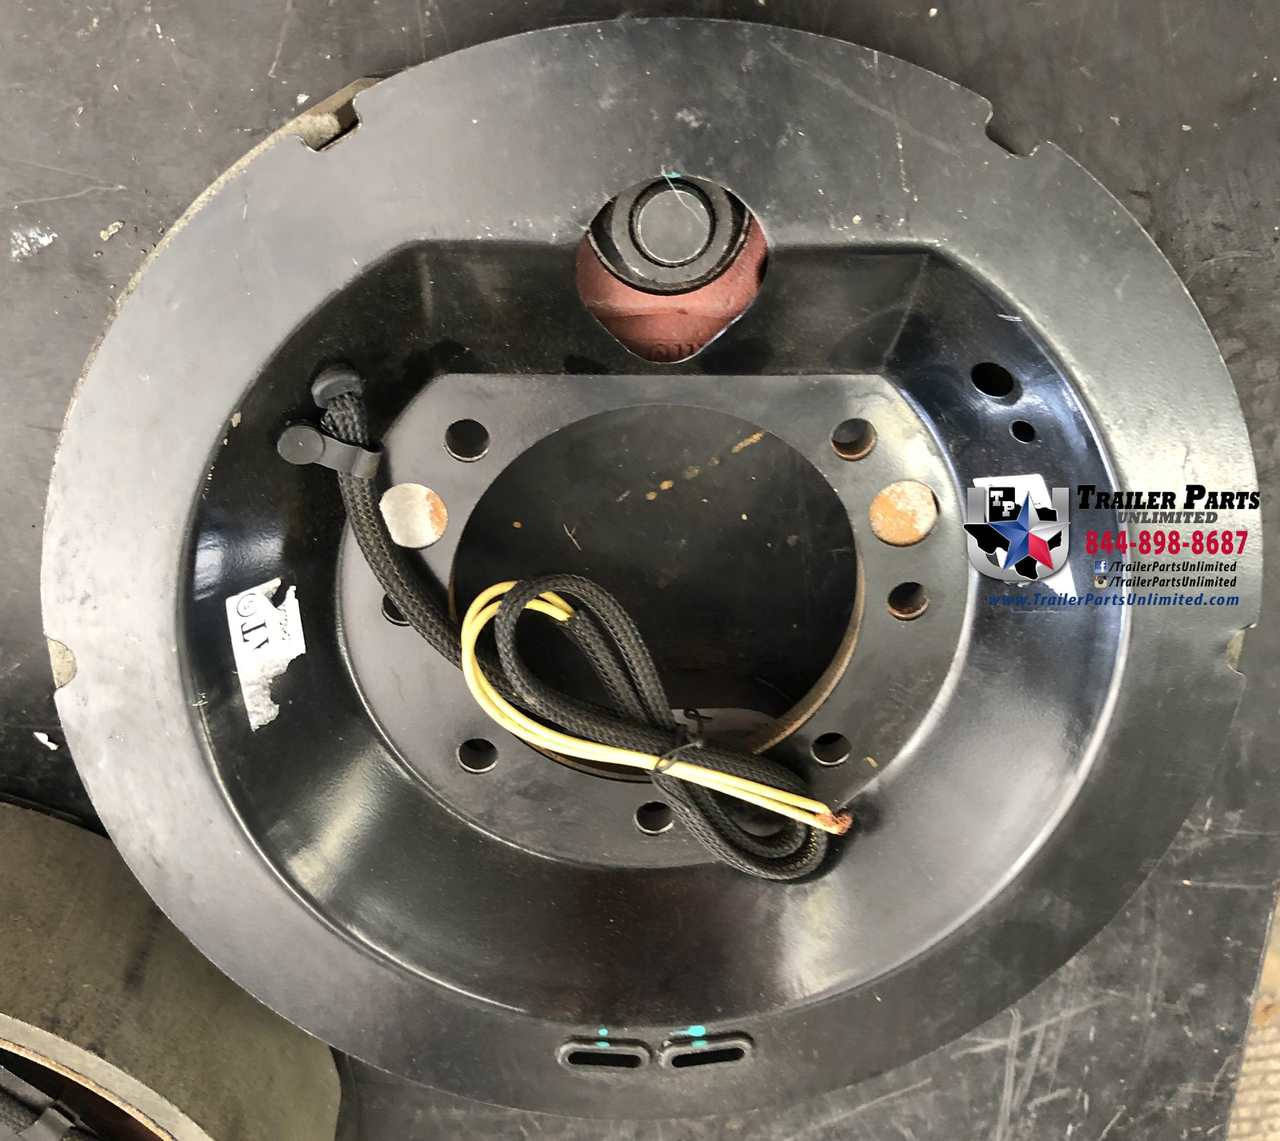 "9K-10K electric self-adjust brake assembly Right Hand (Passenger Side) 12-1/4"" X 3-3/8"" for Dexter Axles"